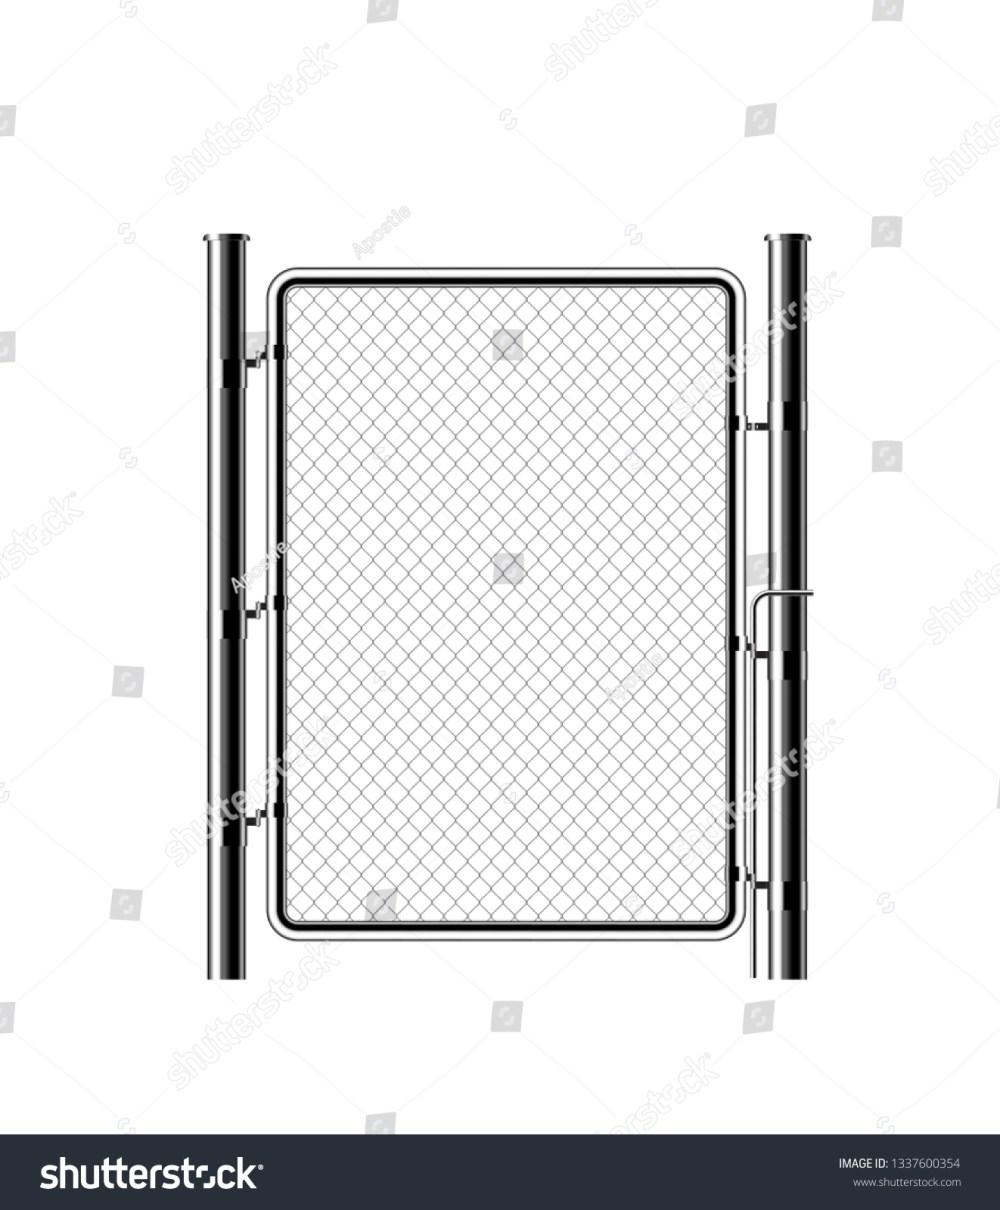 medium resolution of realistic metal chain link fence rabitz art design gate cemetery fence hedge